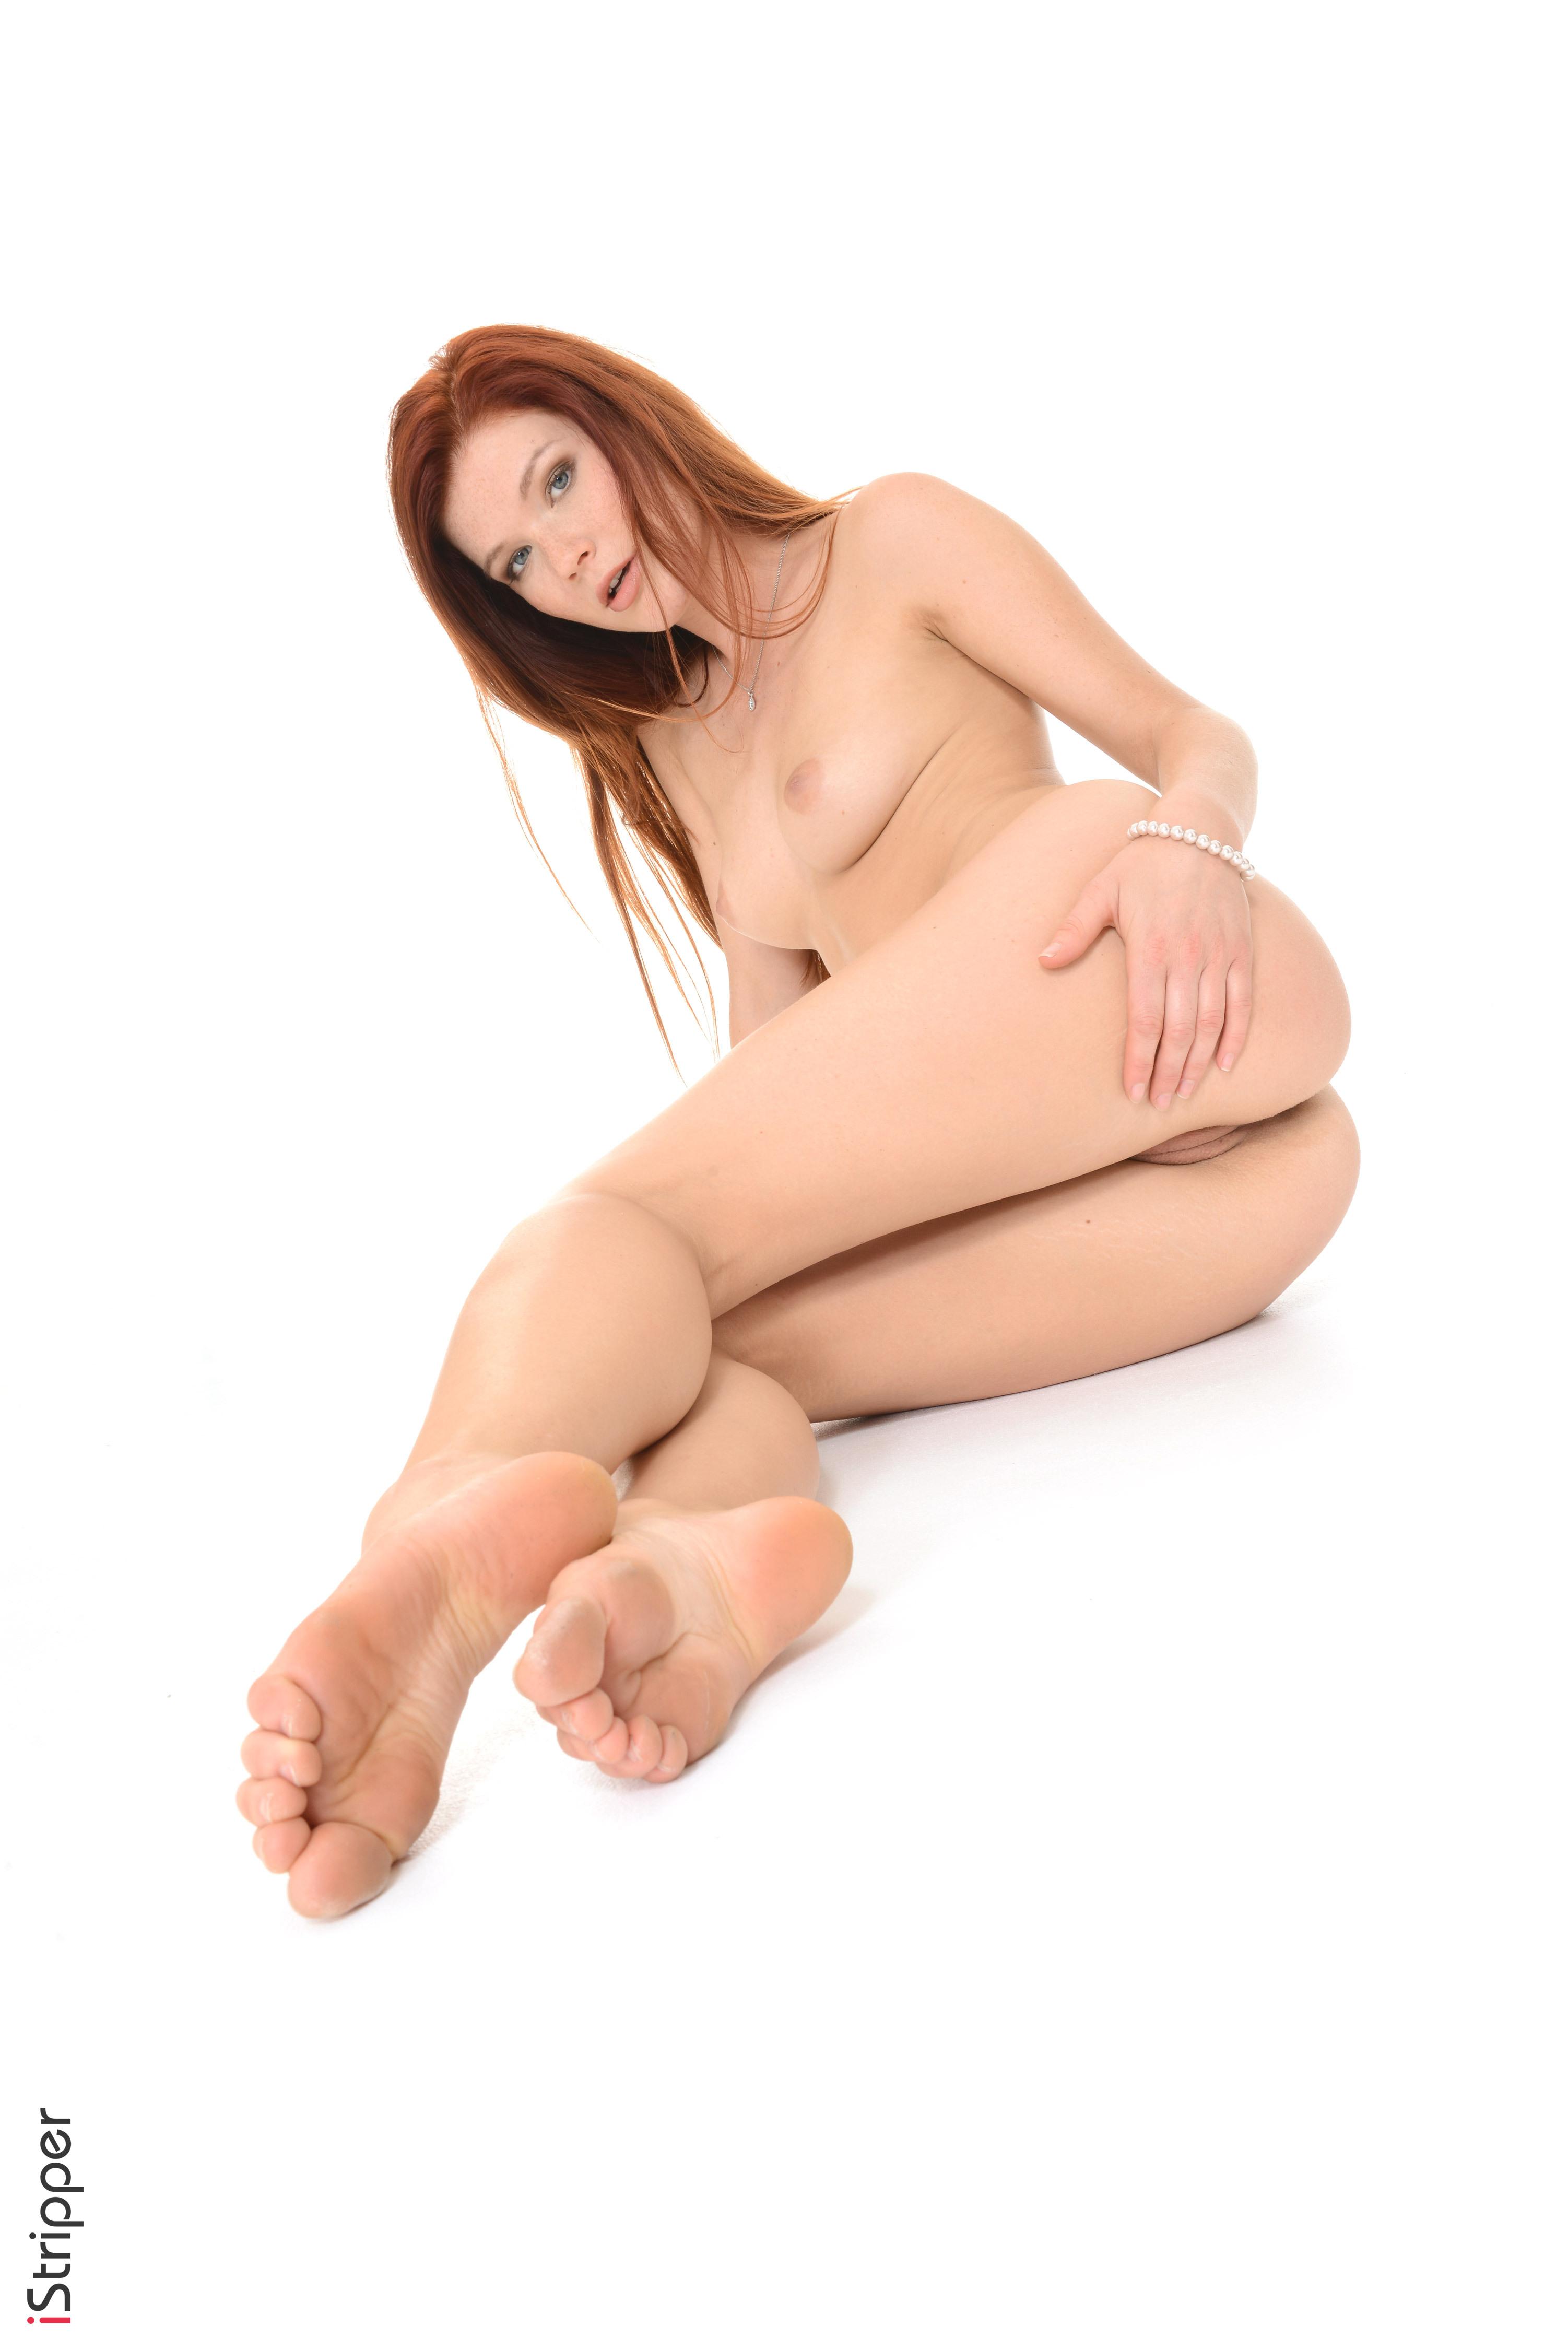 joan severance nude wallpaper